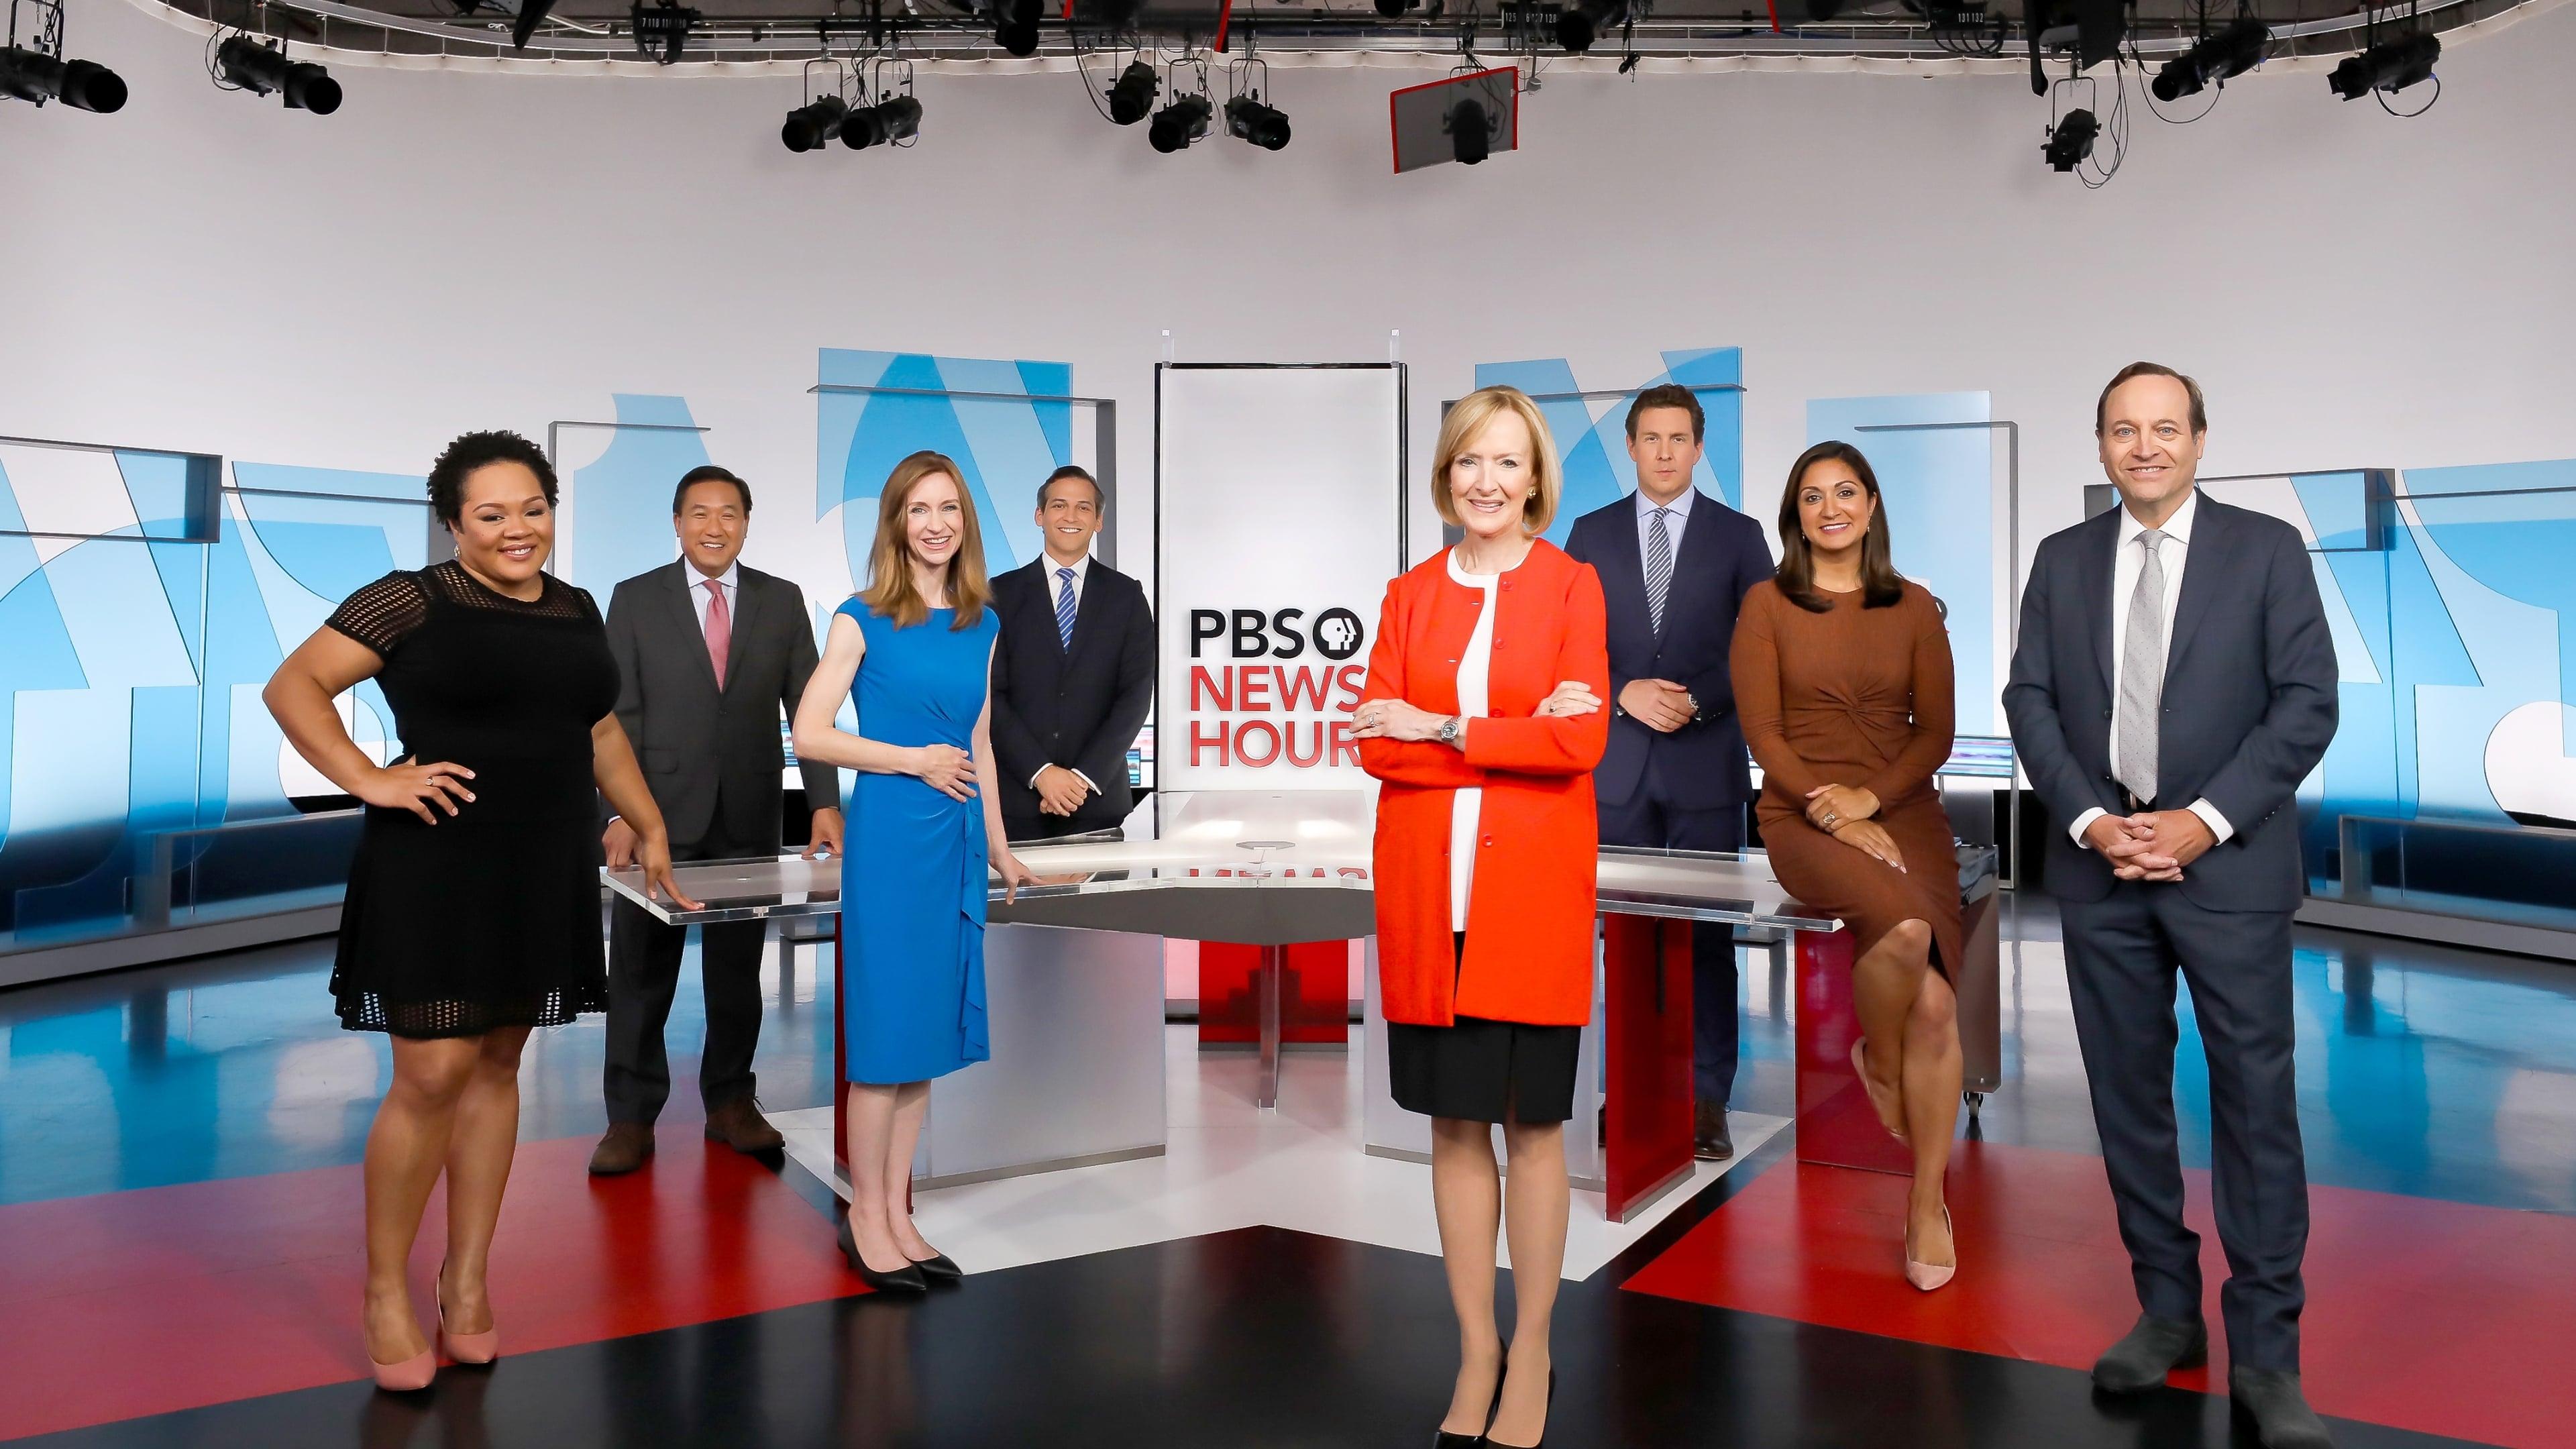 PBS NewsHour - Season 42 Episode 41